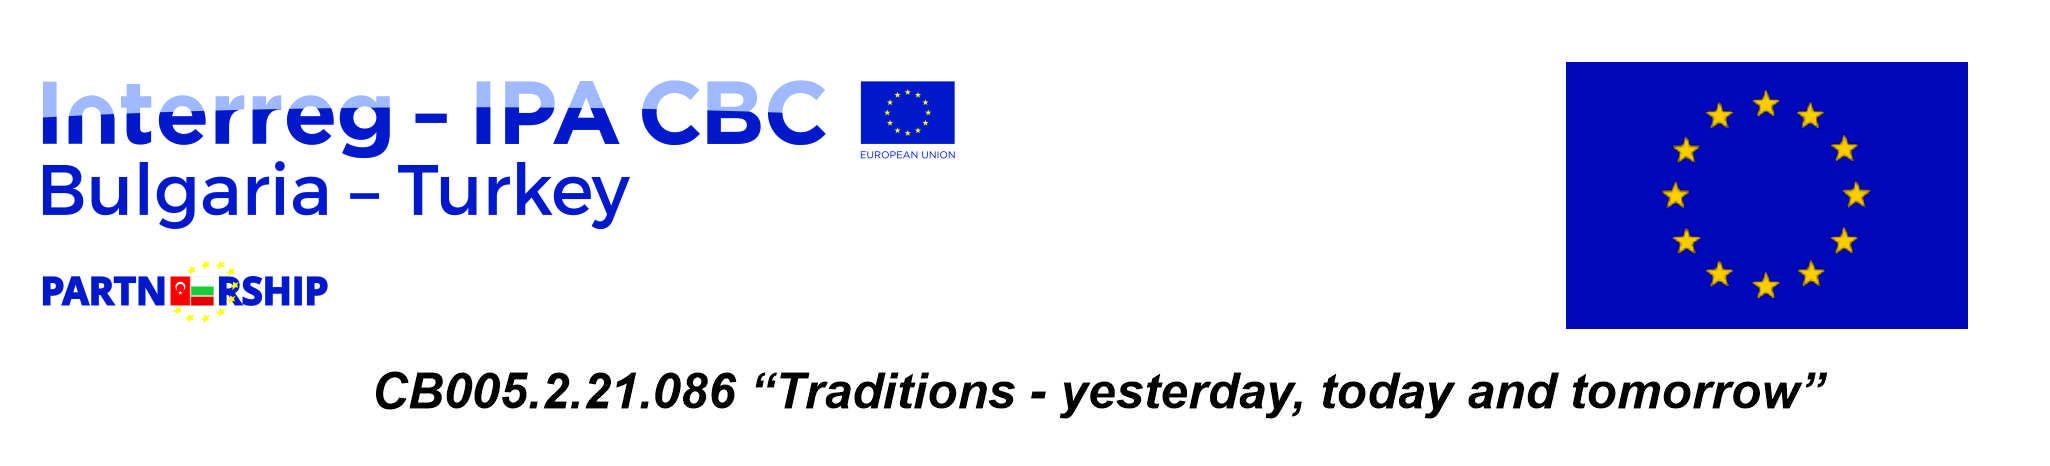 logo-cb005-interreg-ipa-cbc-programme-bg-tr